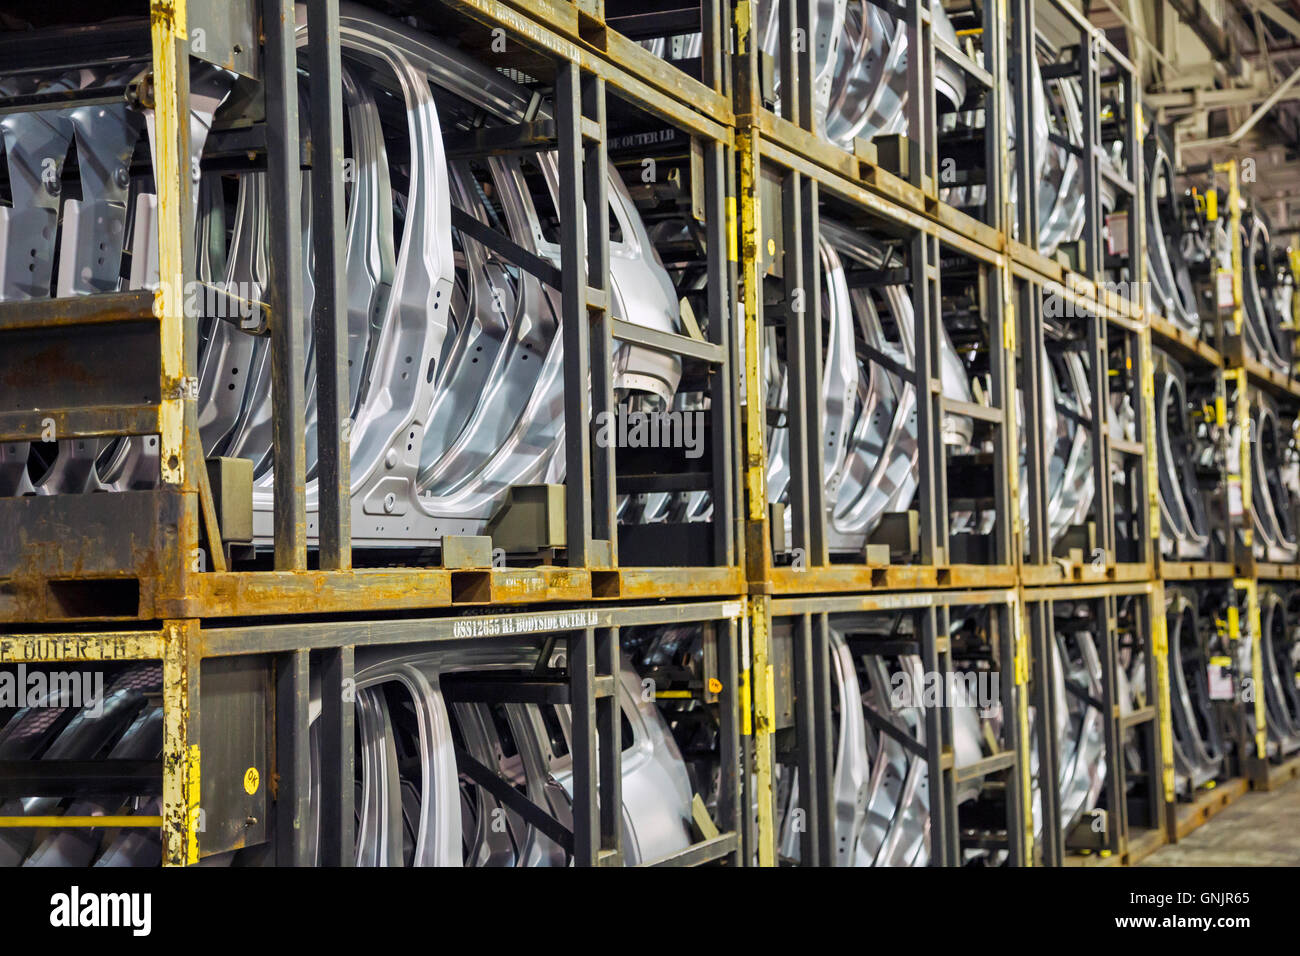 Sterling Heights, Michigan - Automobil-Türverkleidungen in Racks bei Fiat Chrysler Automobiles Sterling Stamping Stockbild